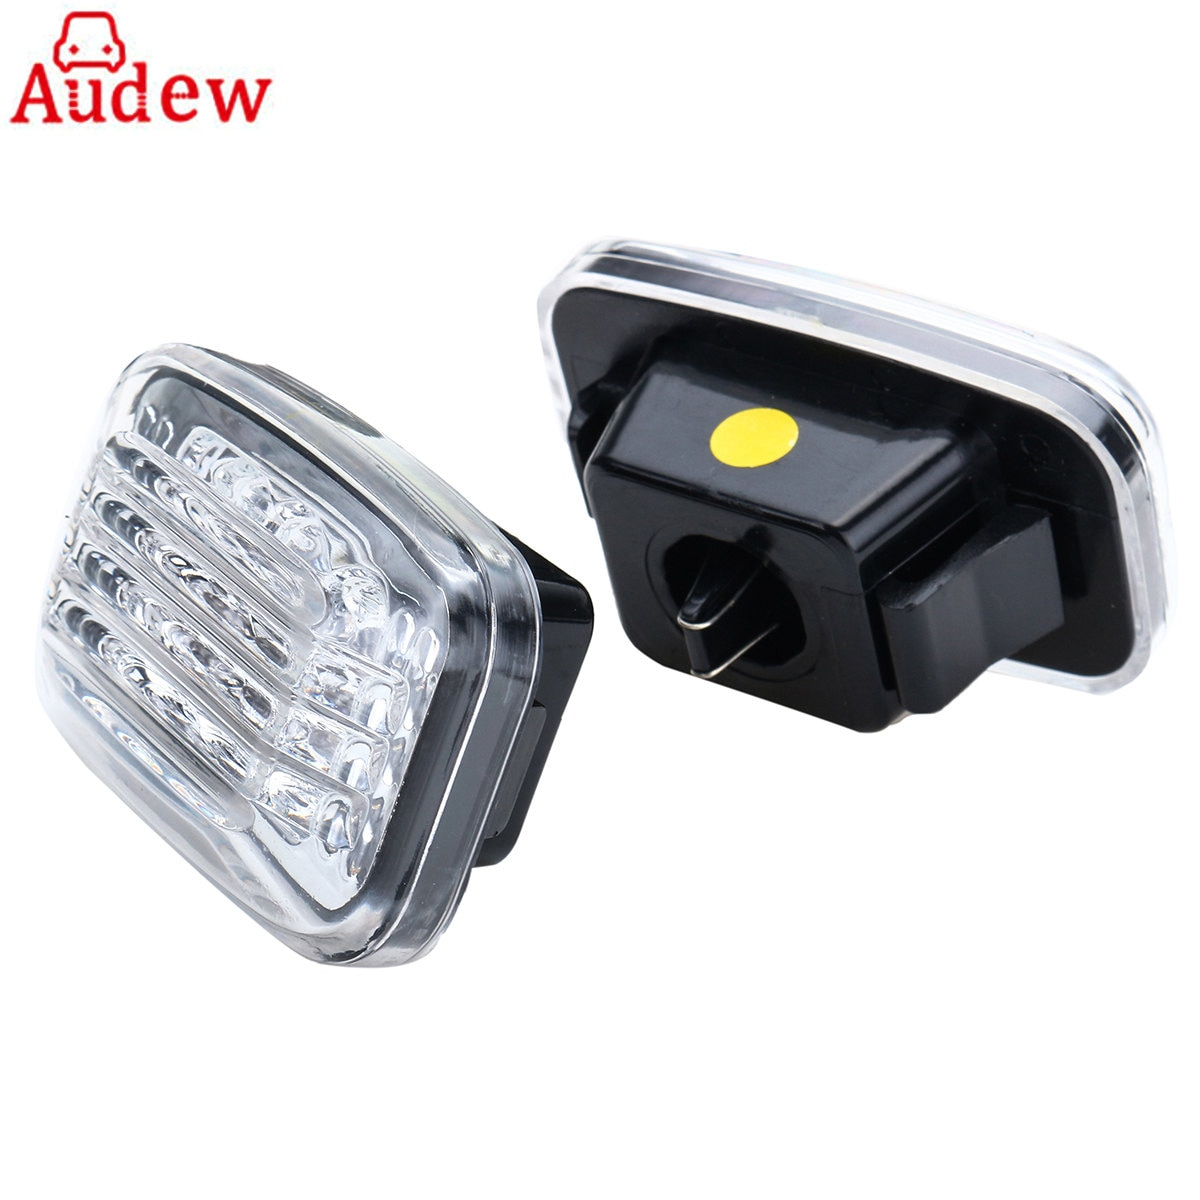 2Pcs Car Side Marker Lamp LED Turn Signal Light For Toyota Land Cruiser 70 80 100 Series Amber